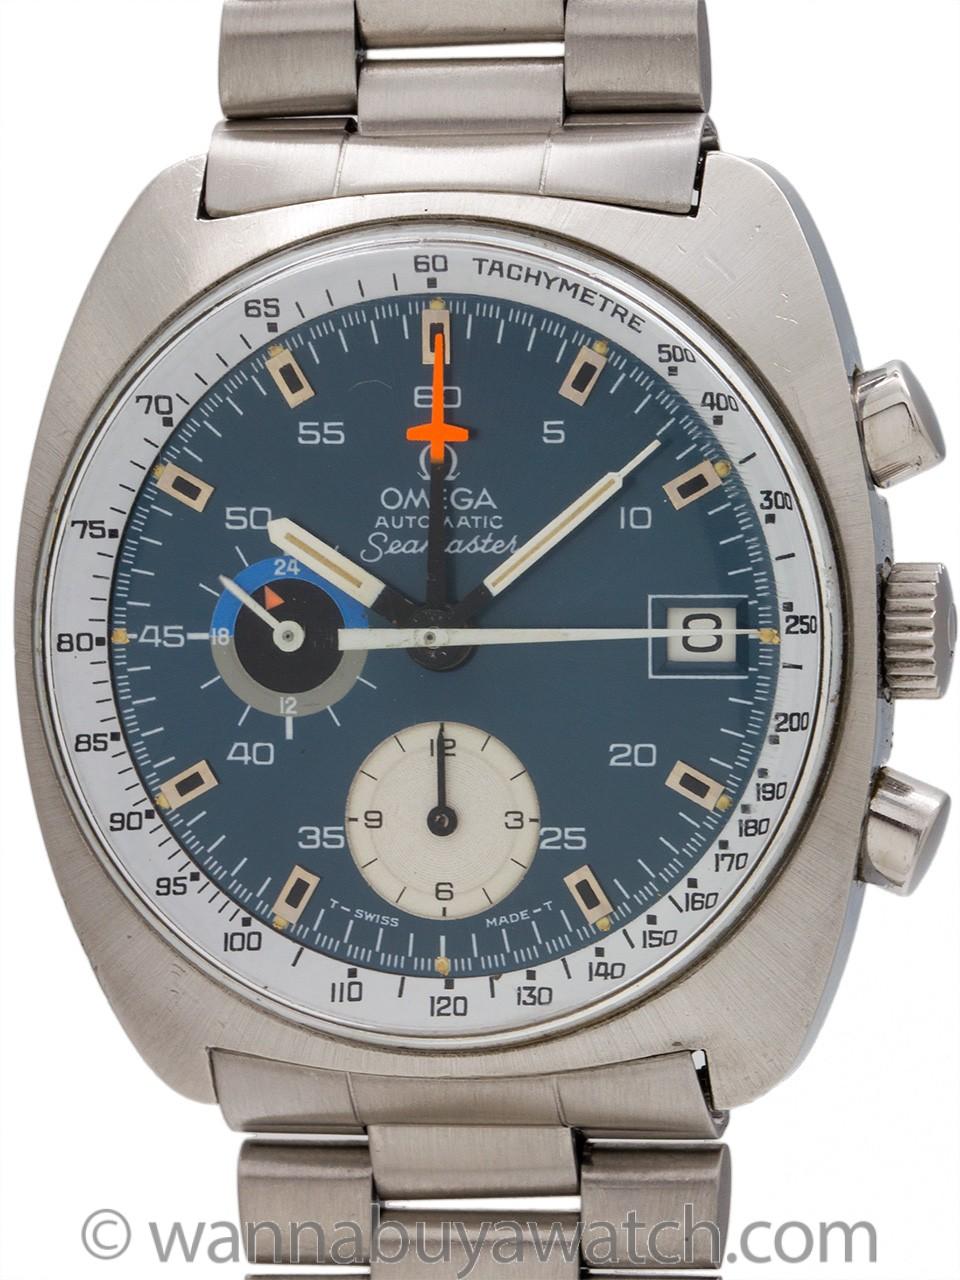 Omega Seamaster Chronograph Automatic ref 176.001 circa 1969